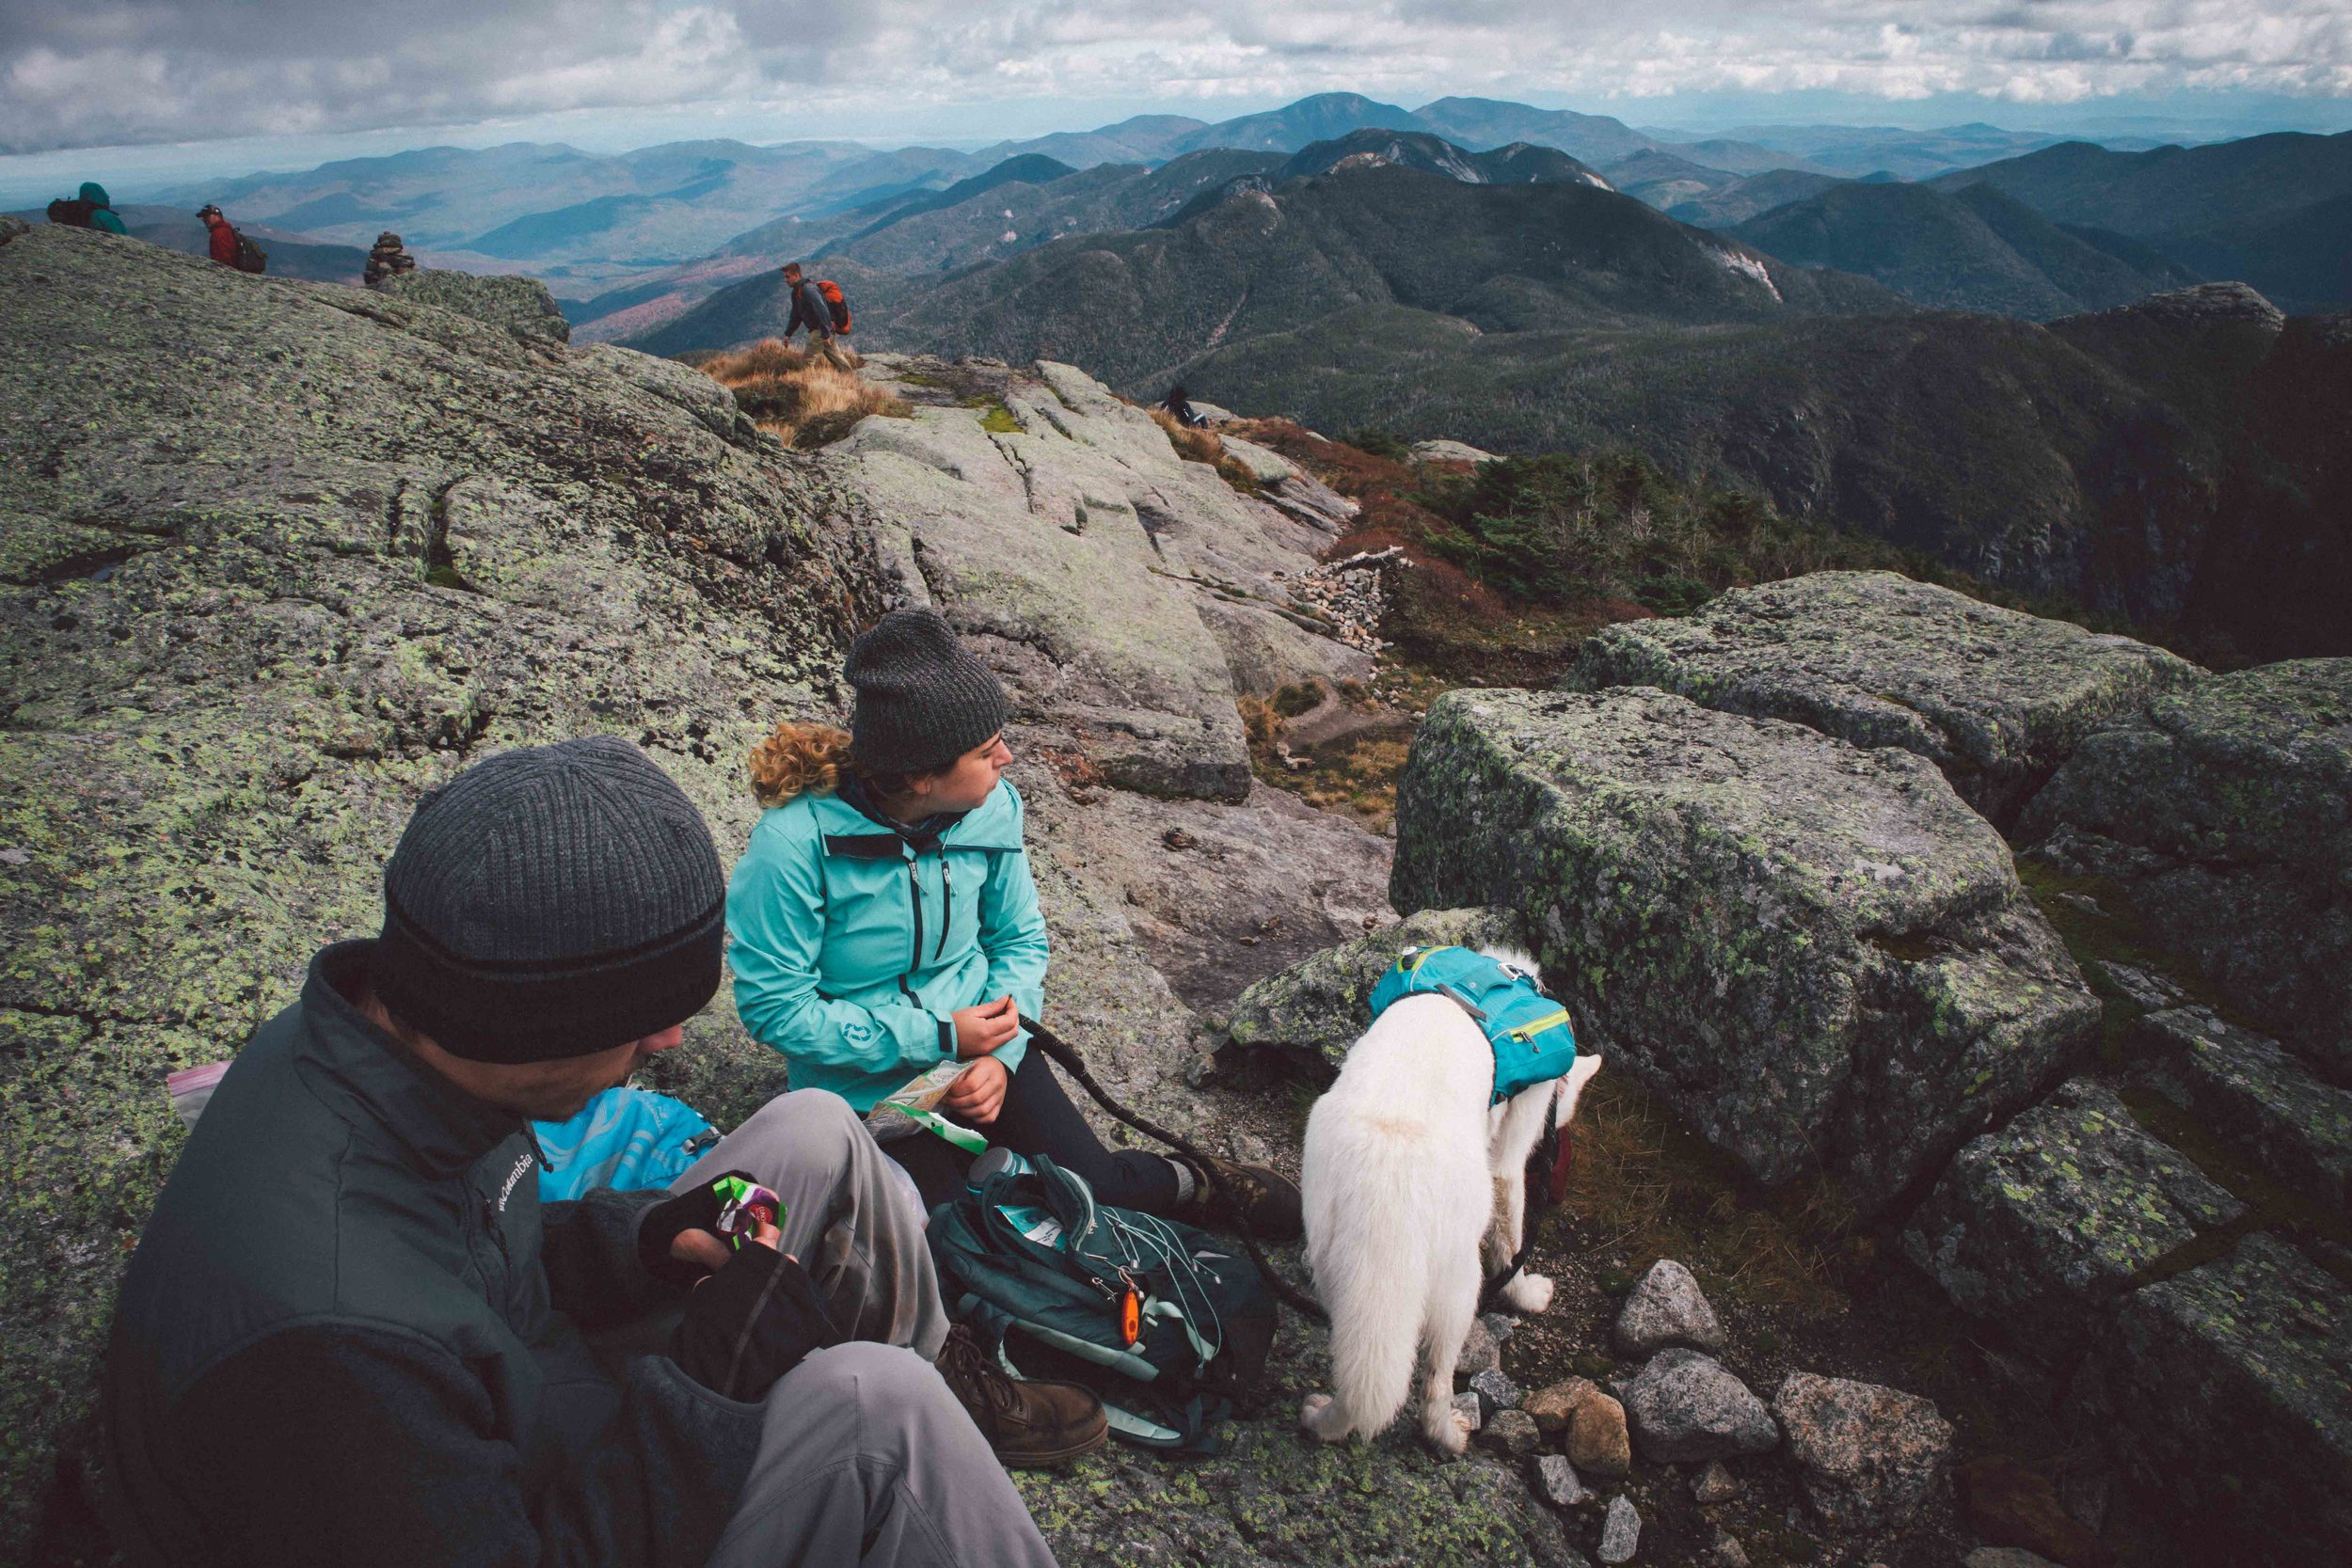 Adirondacks-2018-web-125-Mount-Marcy.jpg